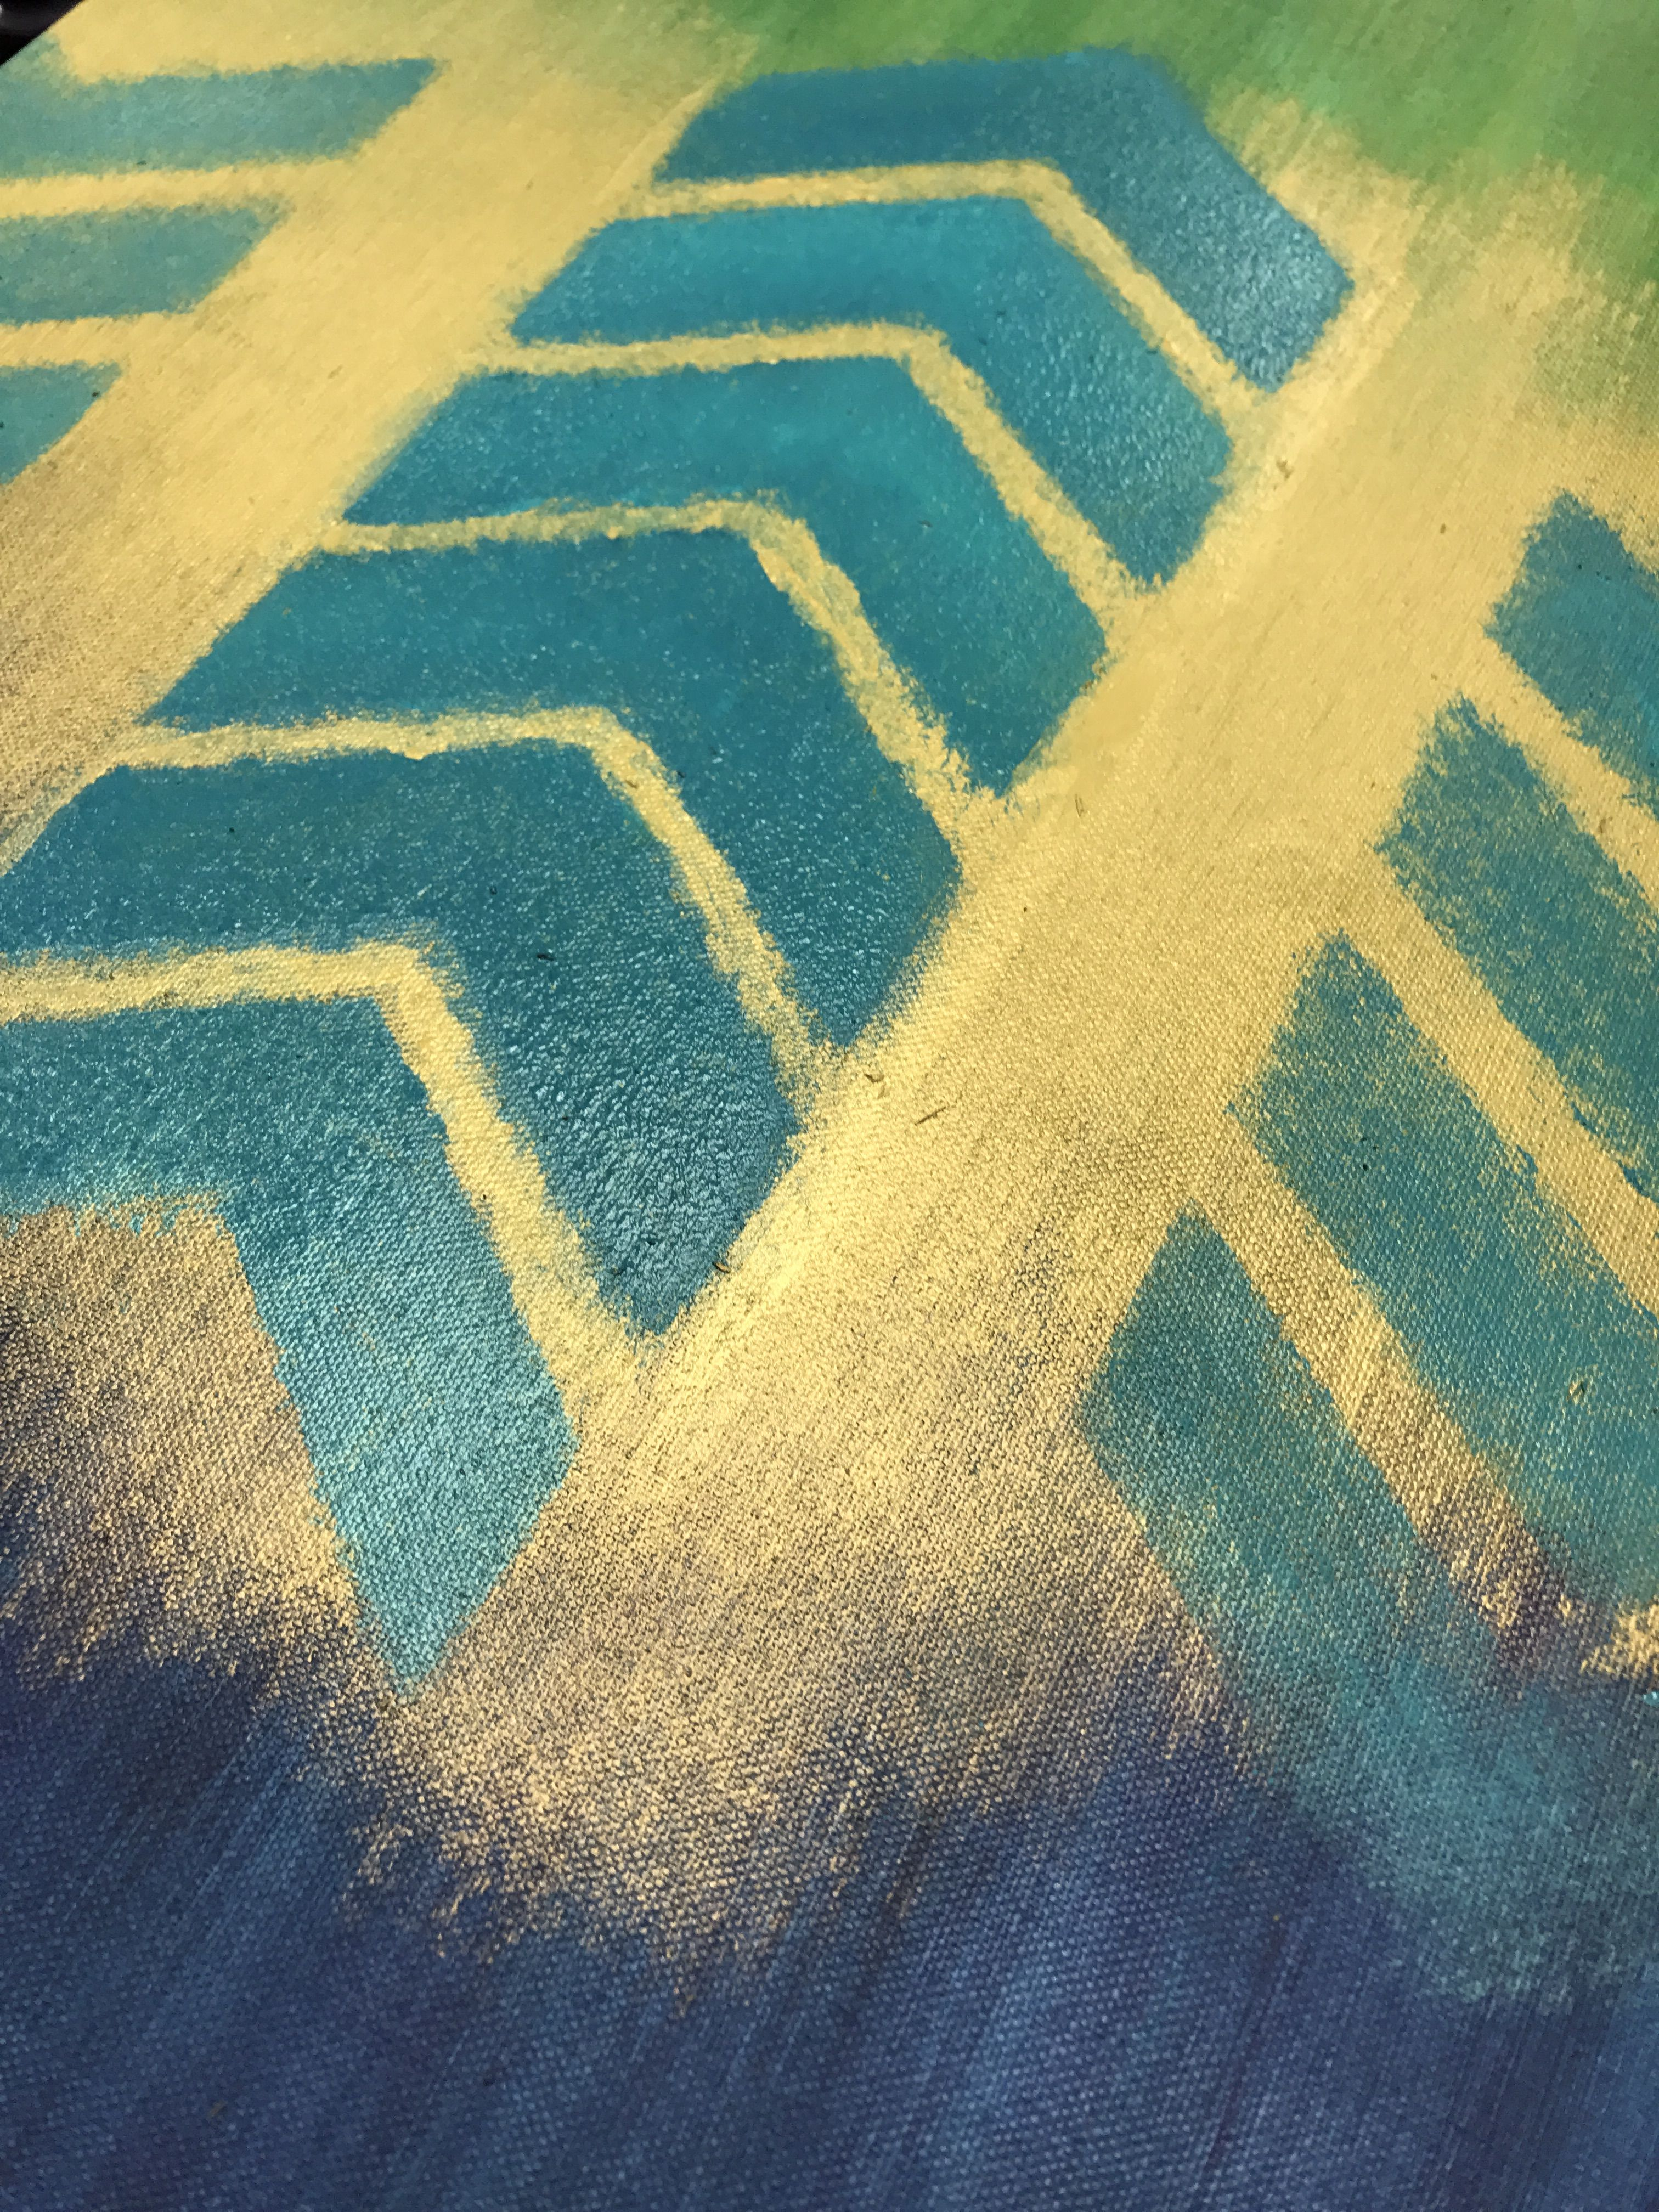 DIY Chevron / Herringbone wall art canvas in navy, teal, green ...